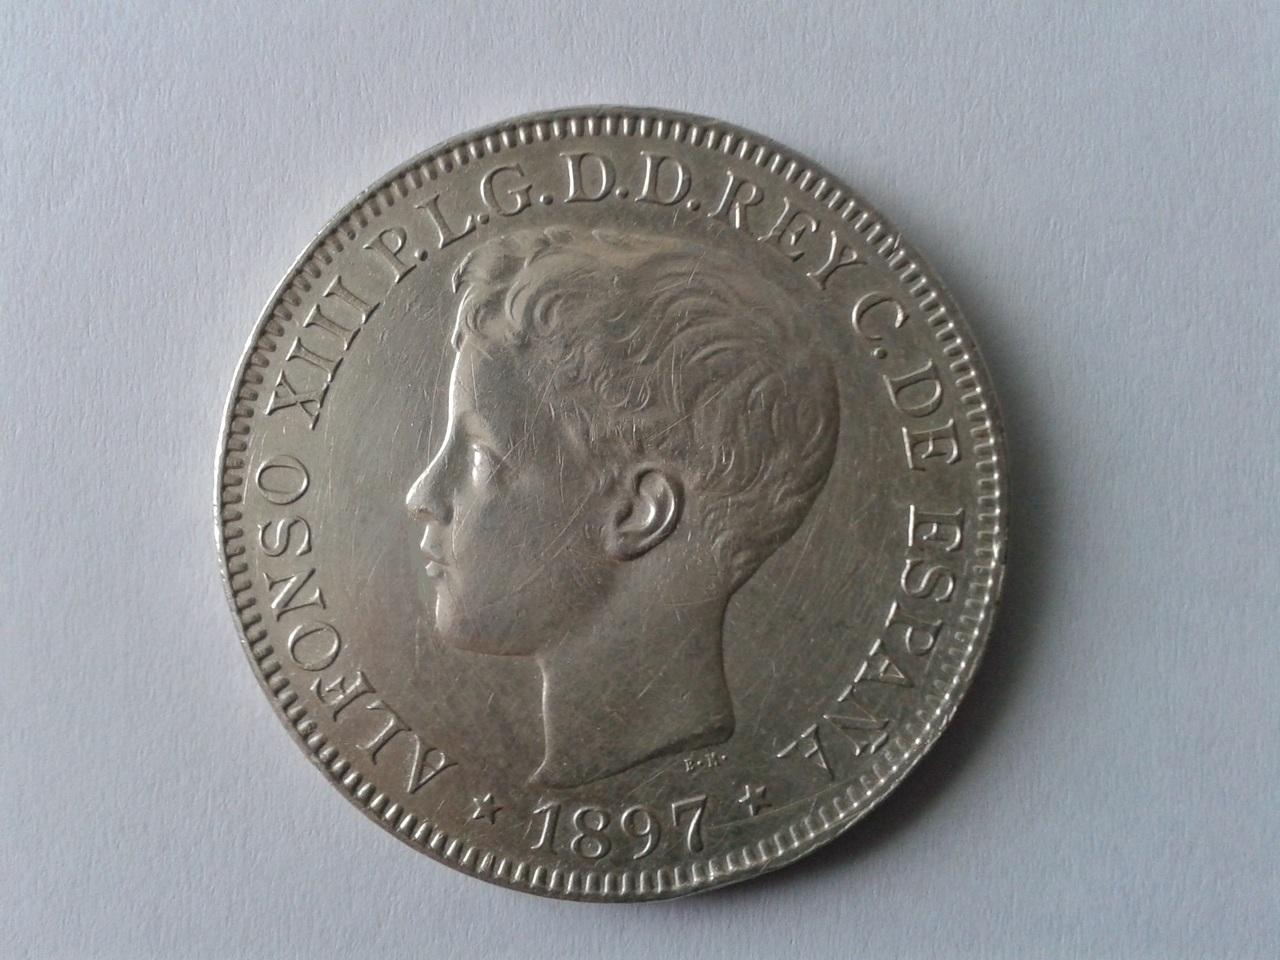 Un PESO Filipinas - 1897 Alfonso XIII 20141018_155442